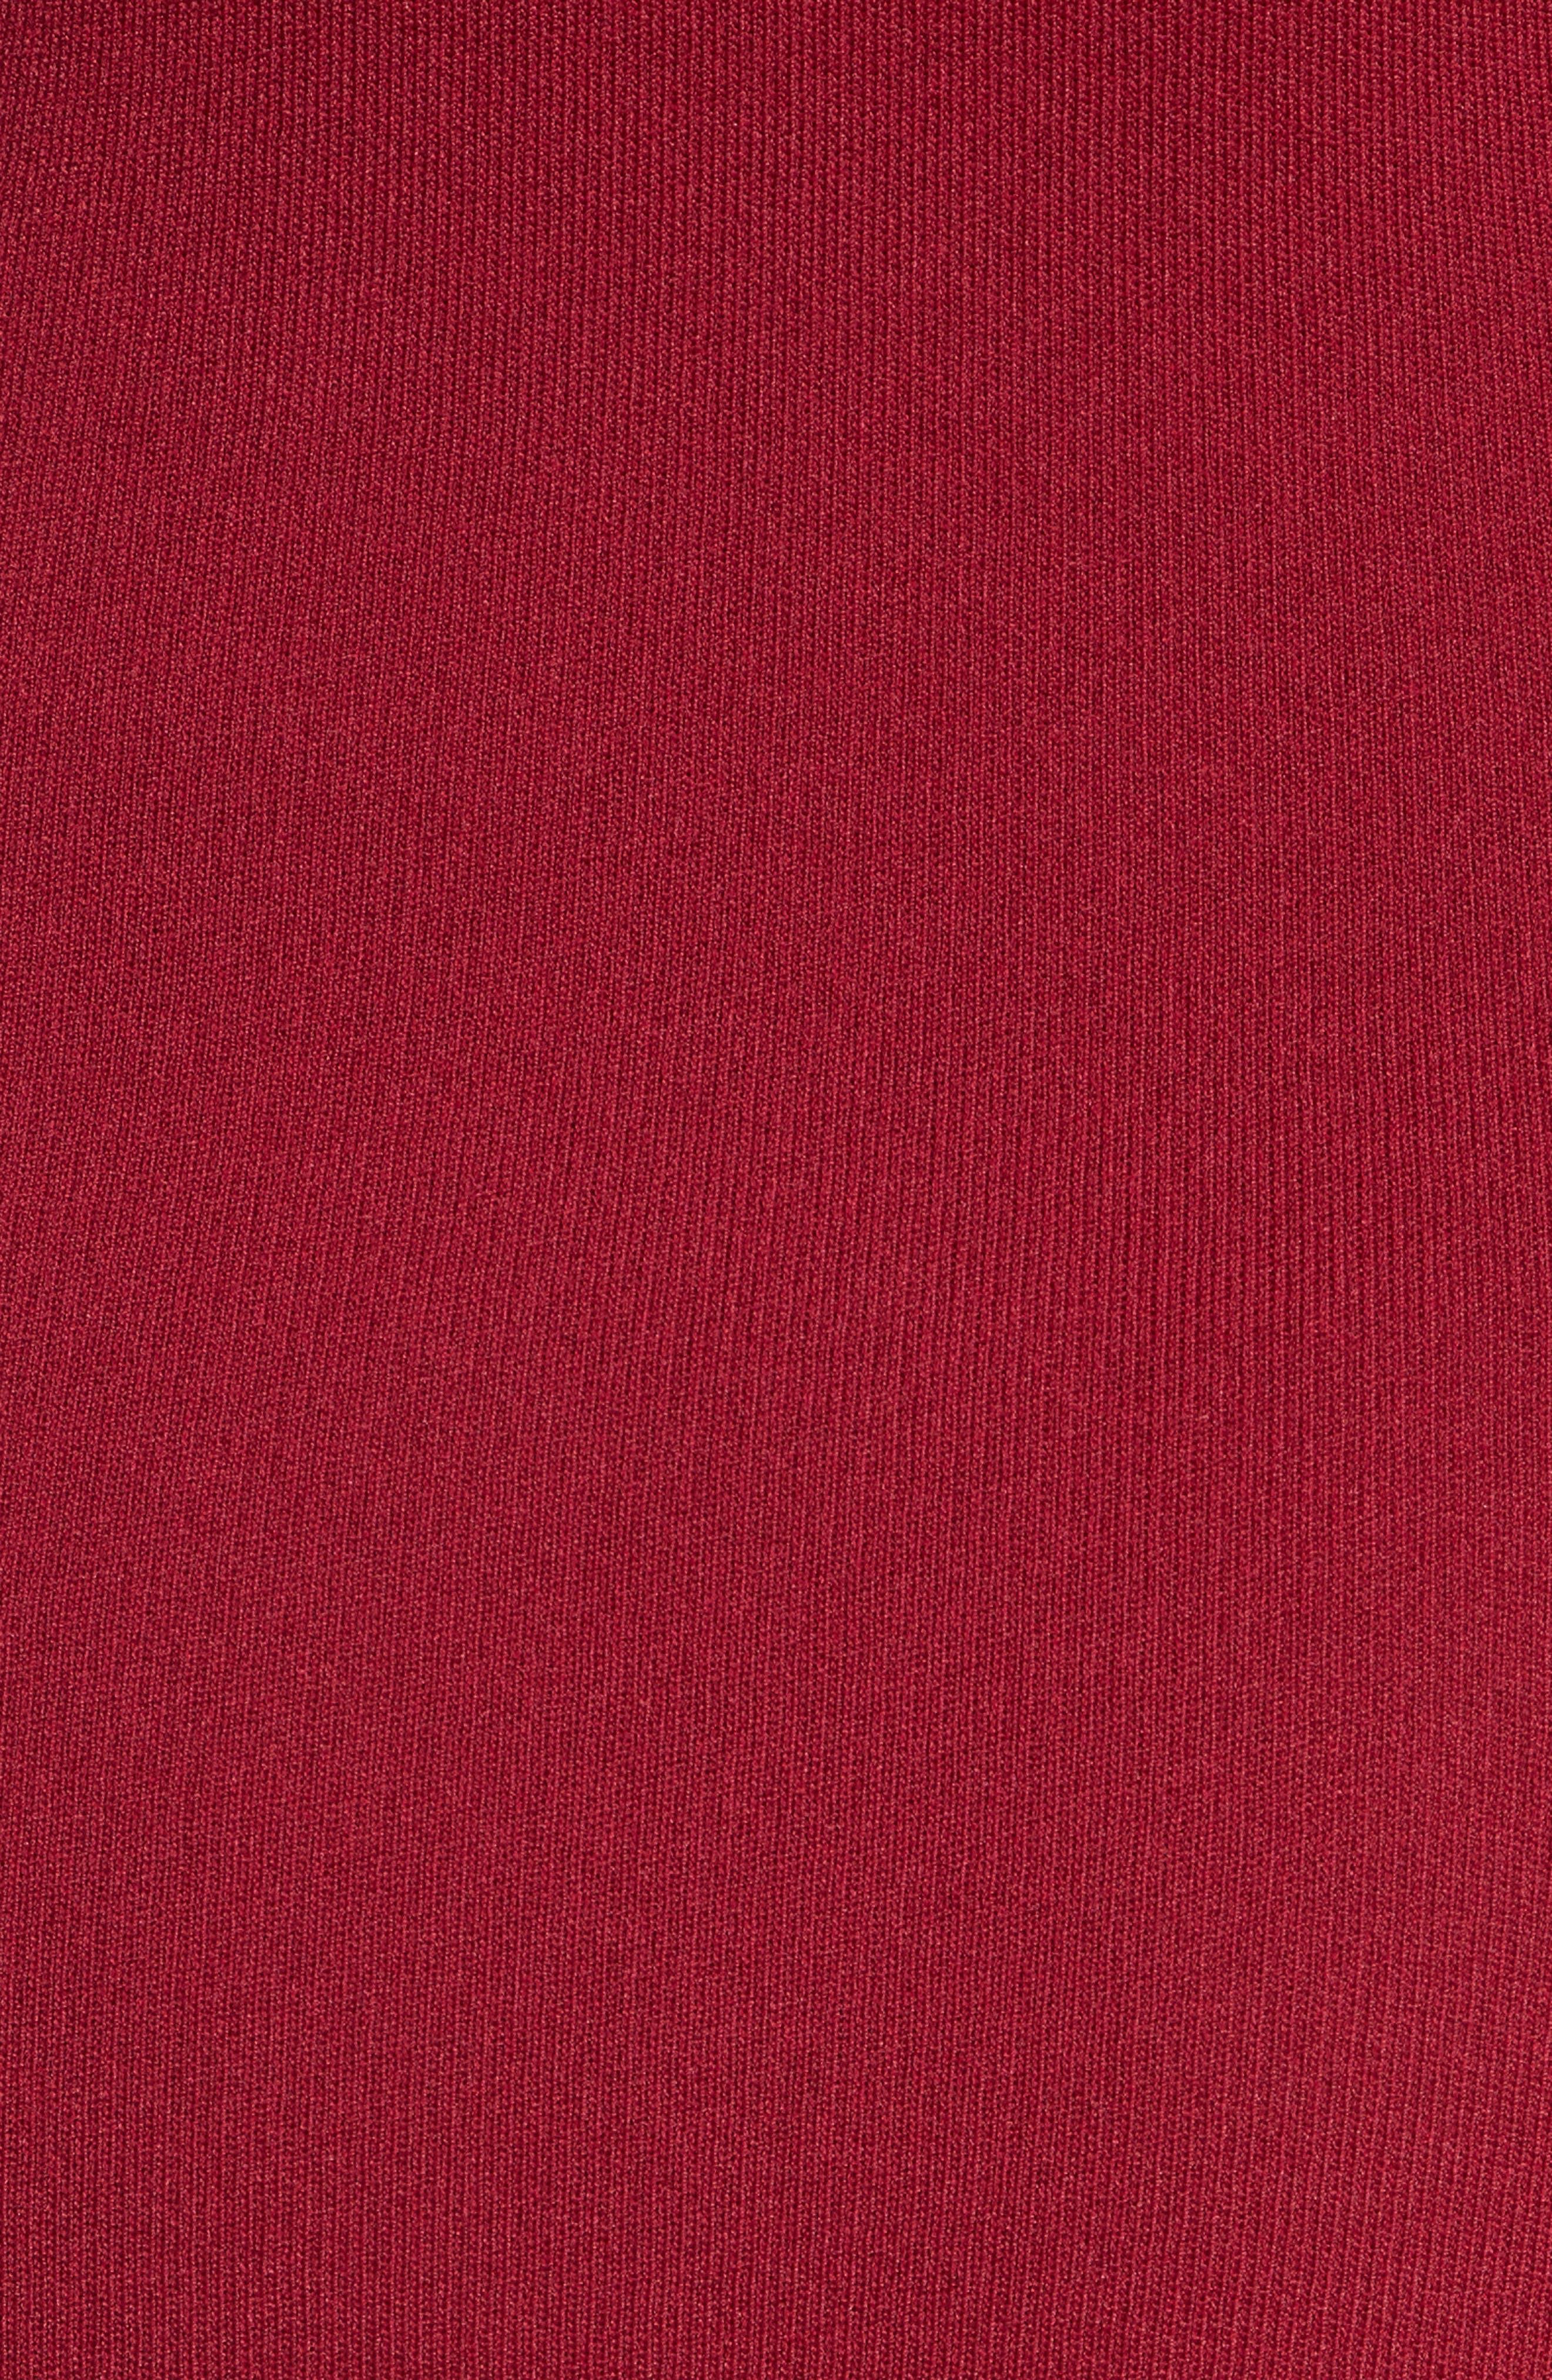 Alternate Image 5  - Jonathan Simkhai Slashed Knit Ruffle Off the Shoulder Dress